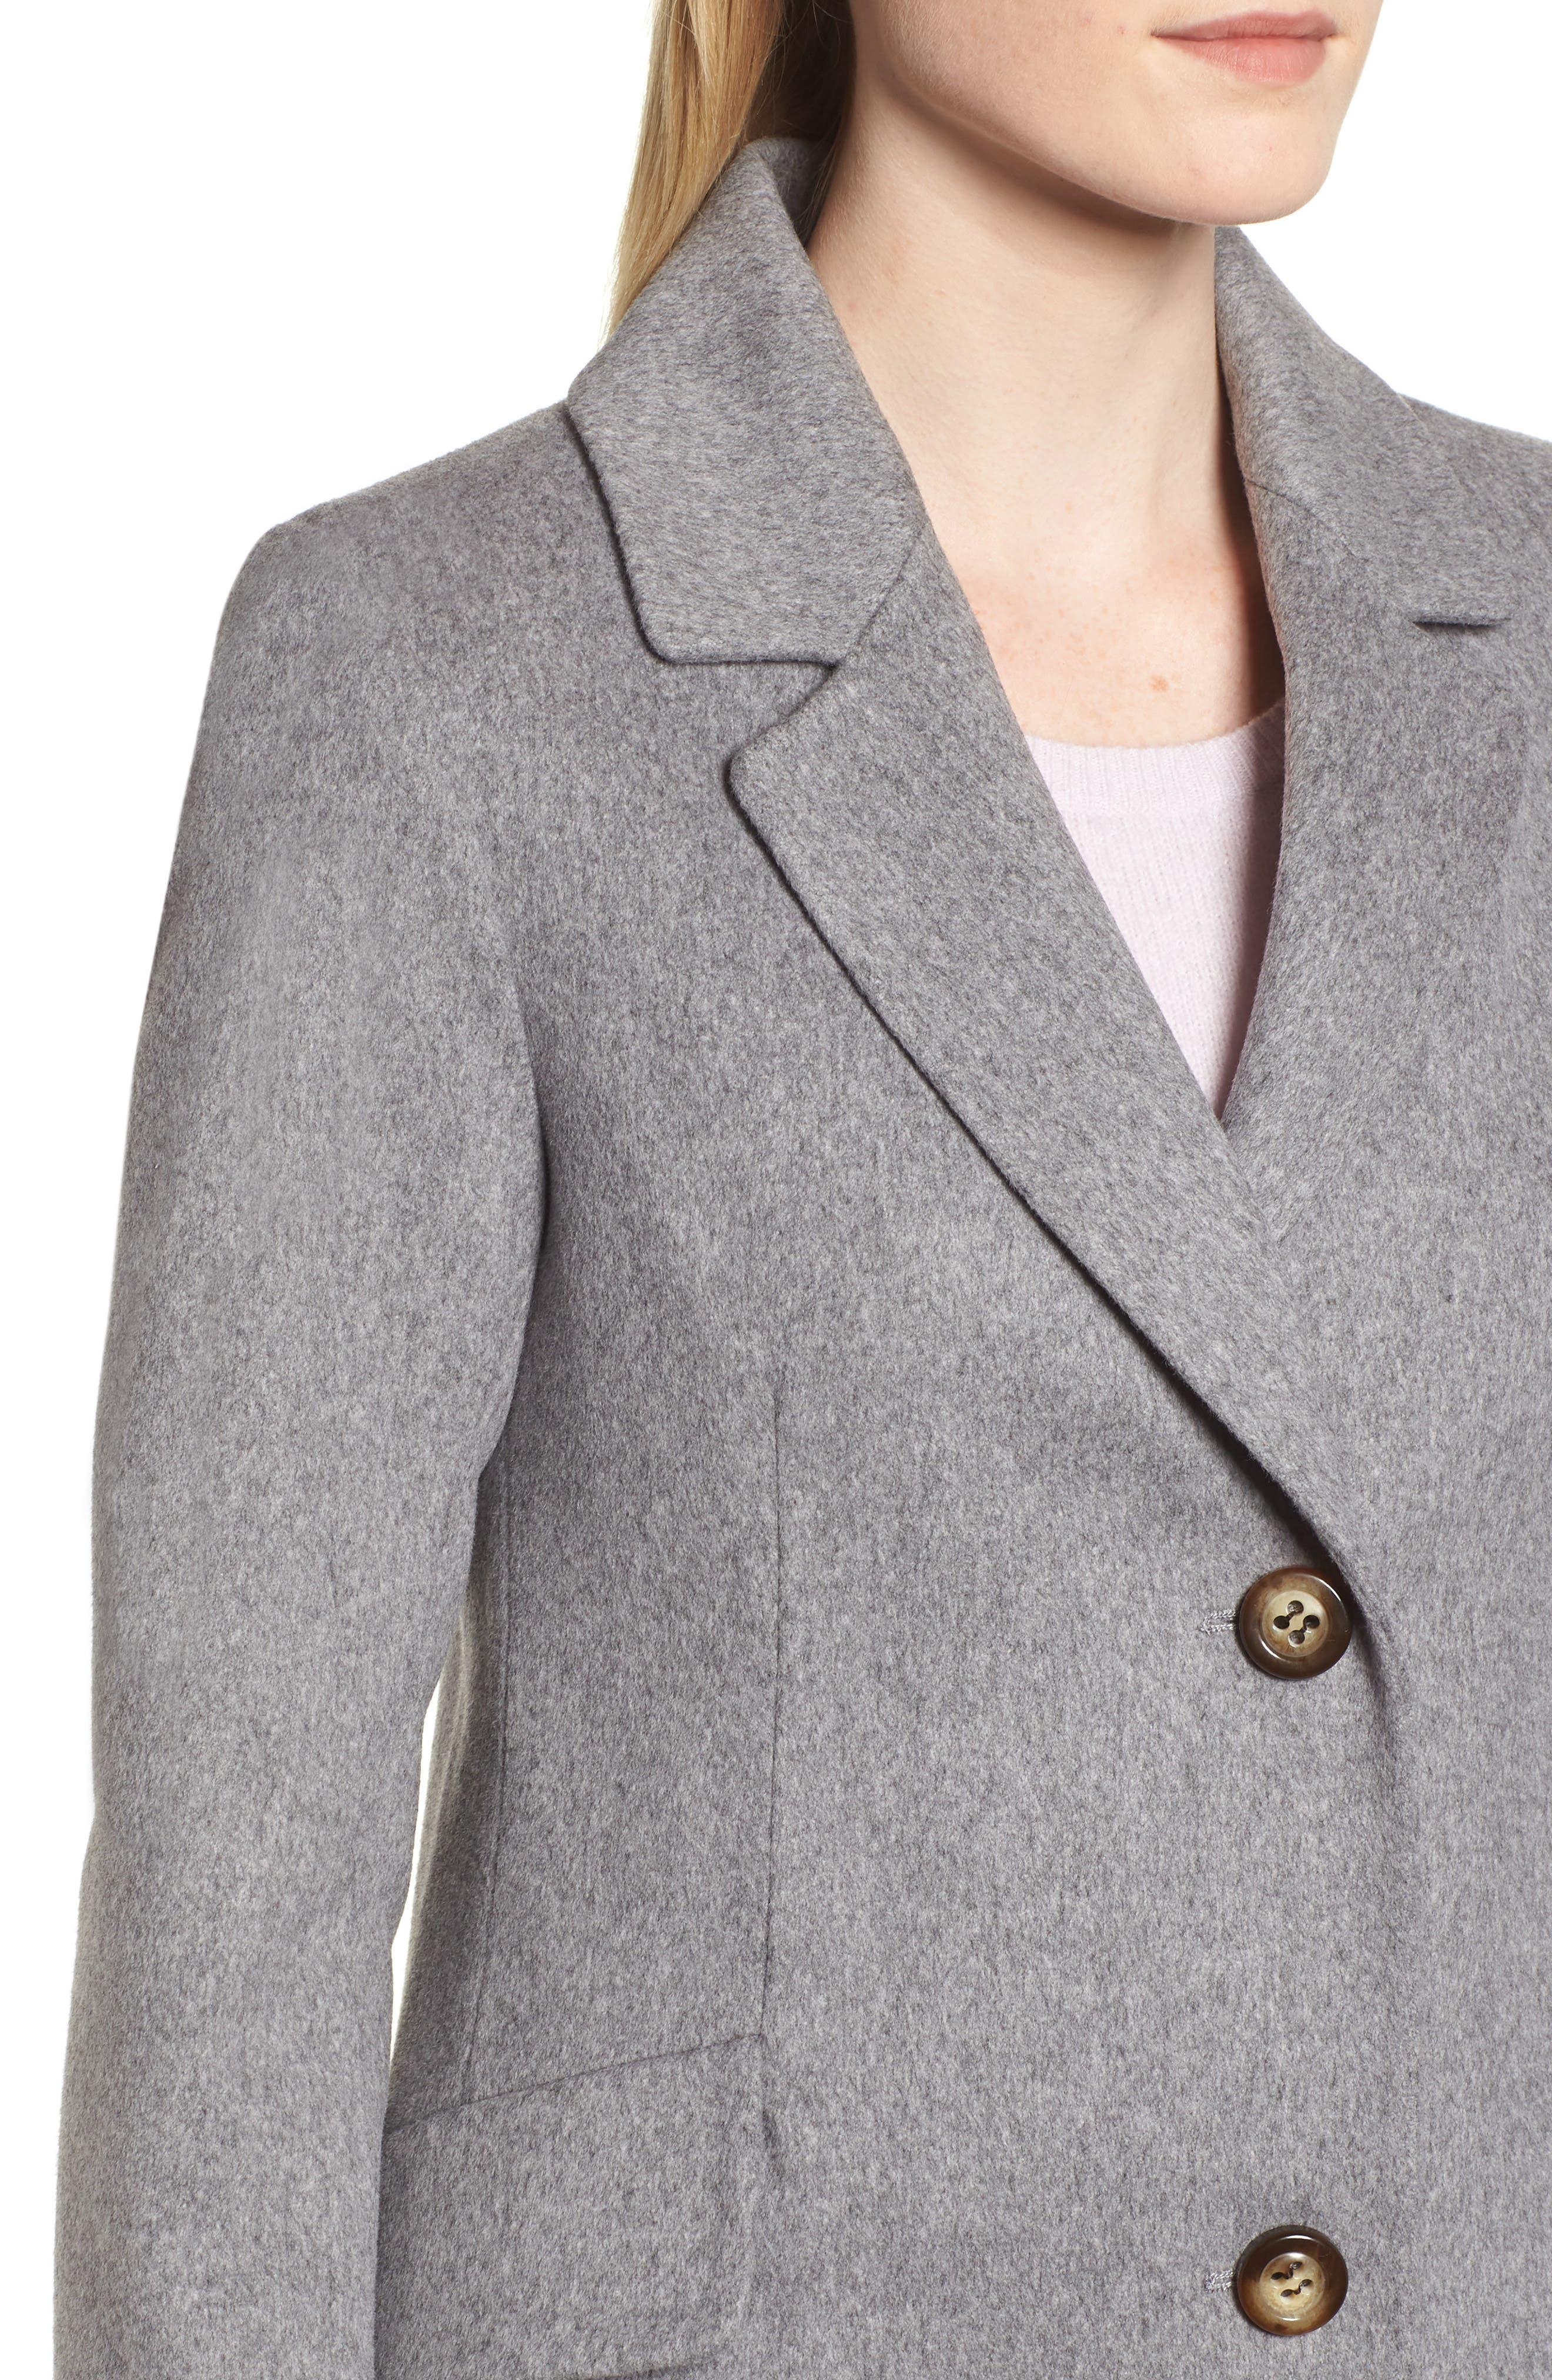 Notch Collar Wool Coat,                             Alternate thumbnail 4, color,                             GREY HEATHER